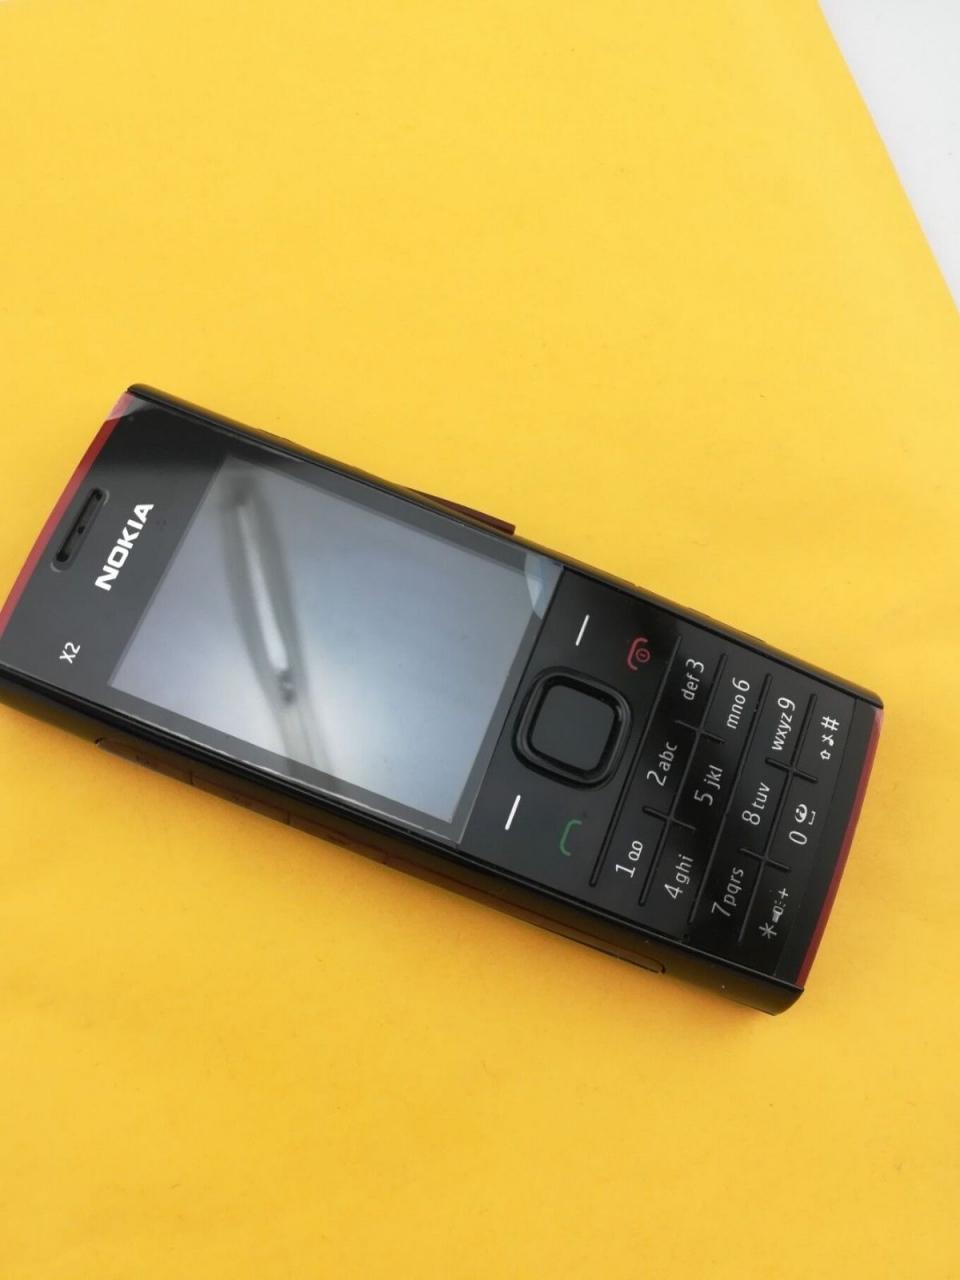 Refurbished phone Nokia X2-00 Bluetooth FM JAVA 5MP Cell Phones Free Shipping black 9